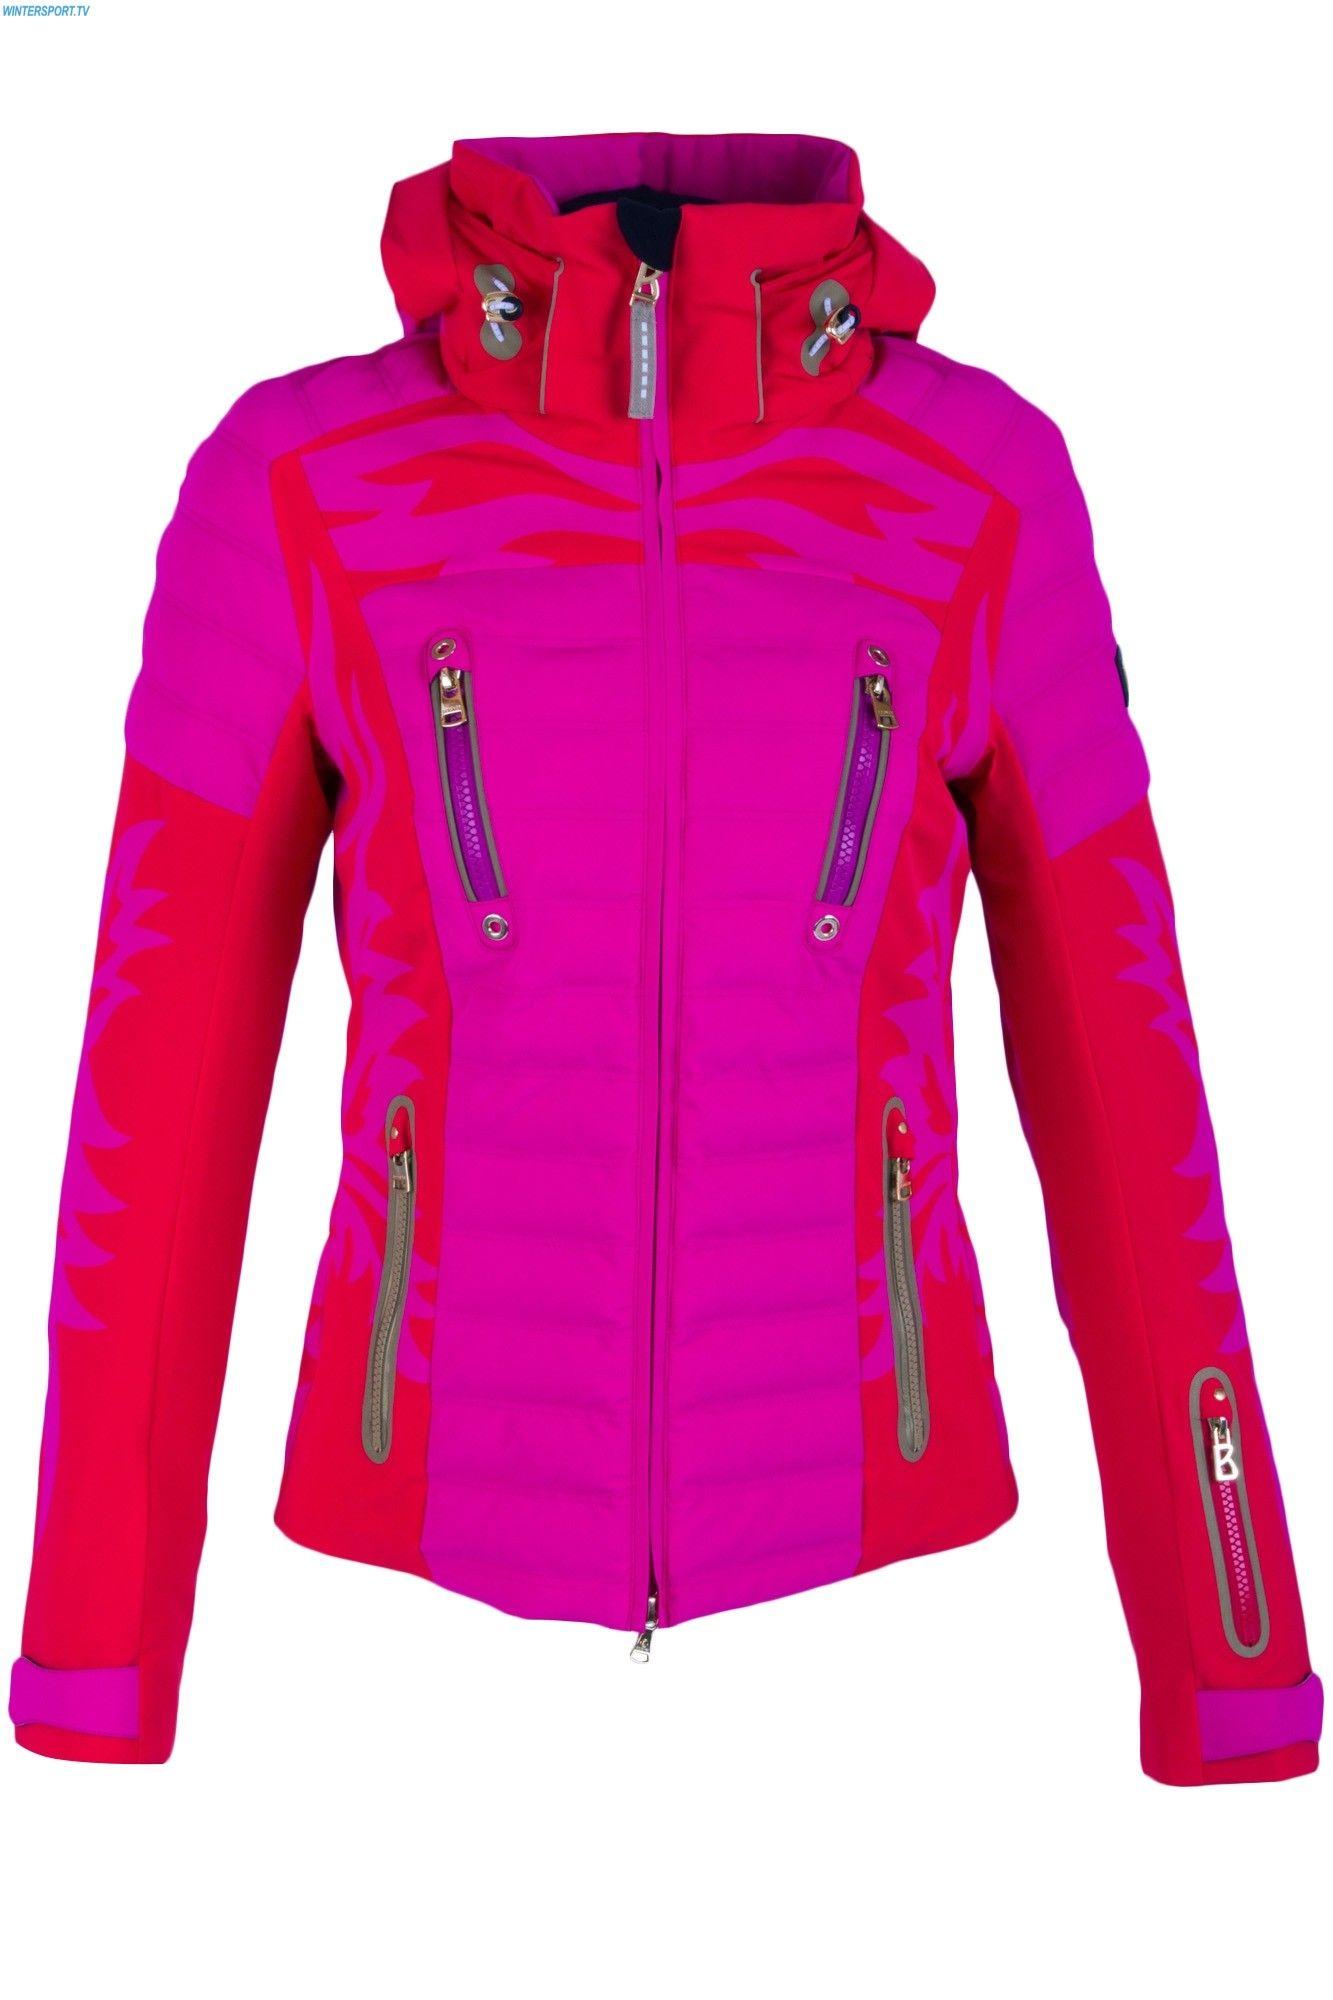 1f481ec7b5 Bogner Women Paula Ski Jacket - Hot Red Dark Orchid